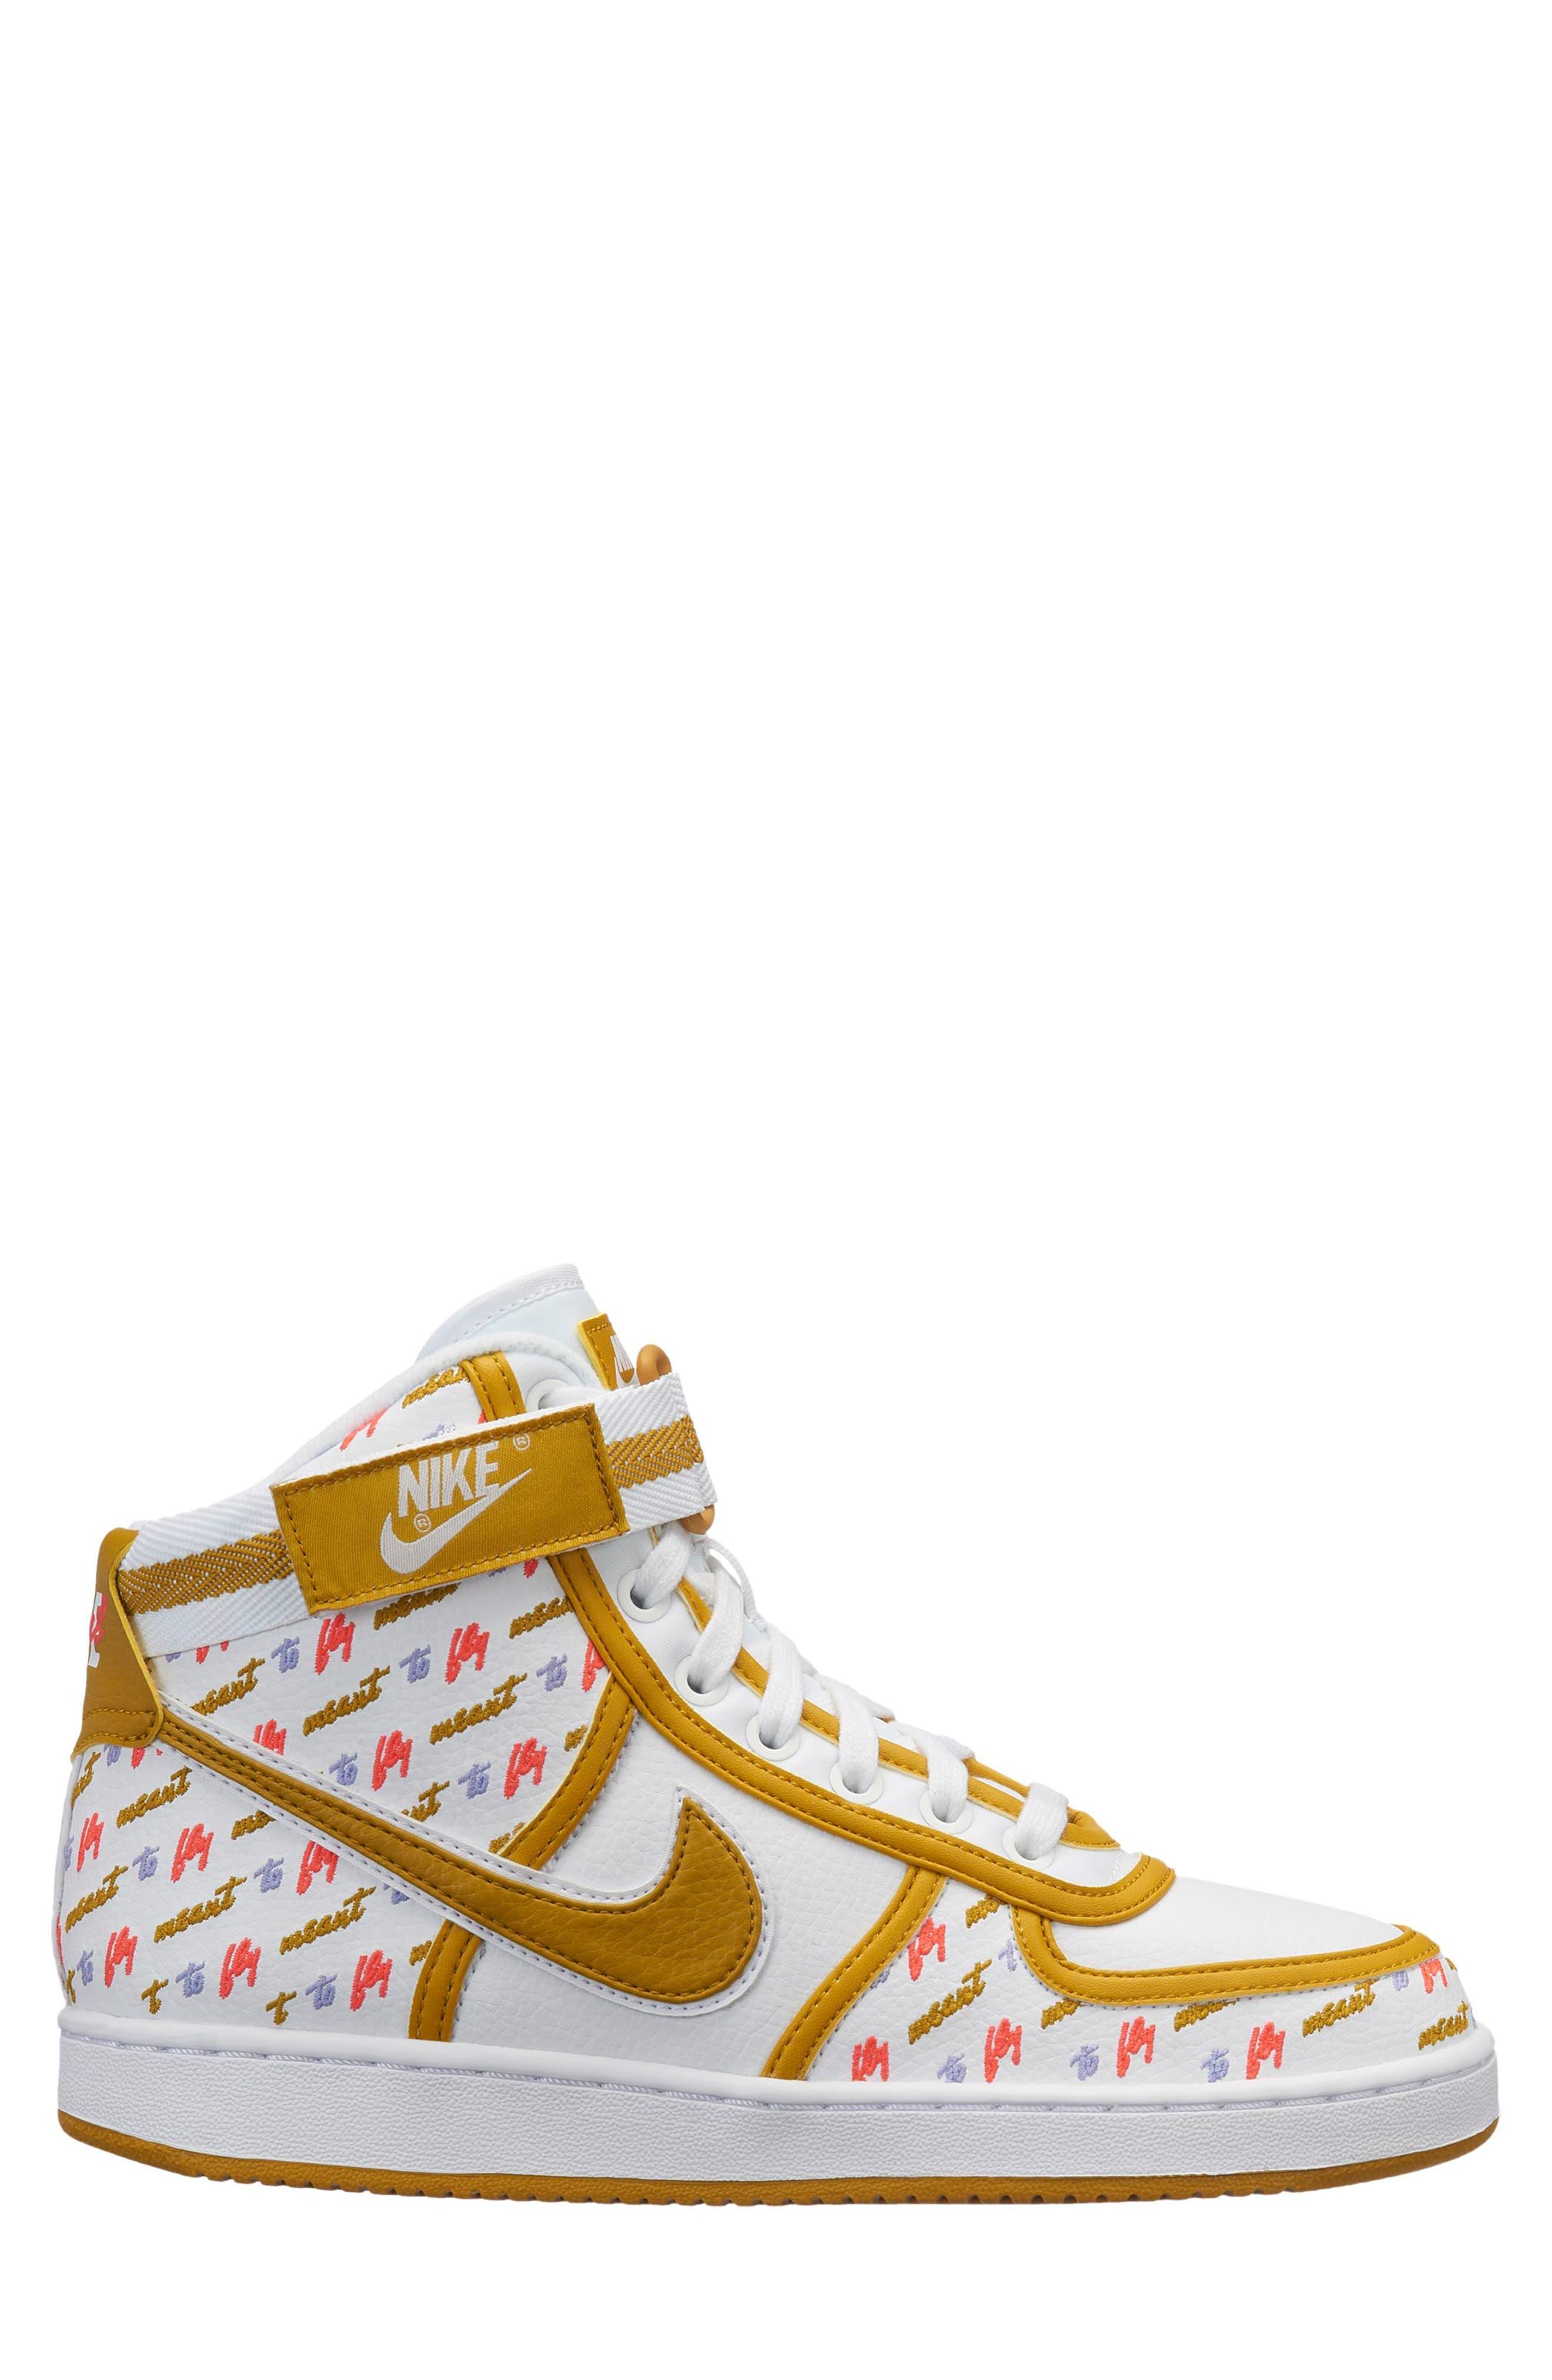 Vandal High Lux Sneaker,                         Main,                         color, WHITE/ CITRON/ TWILIGHT PULSE